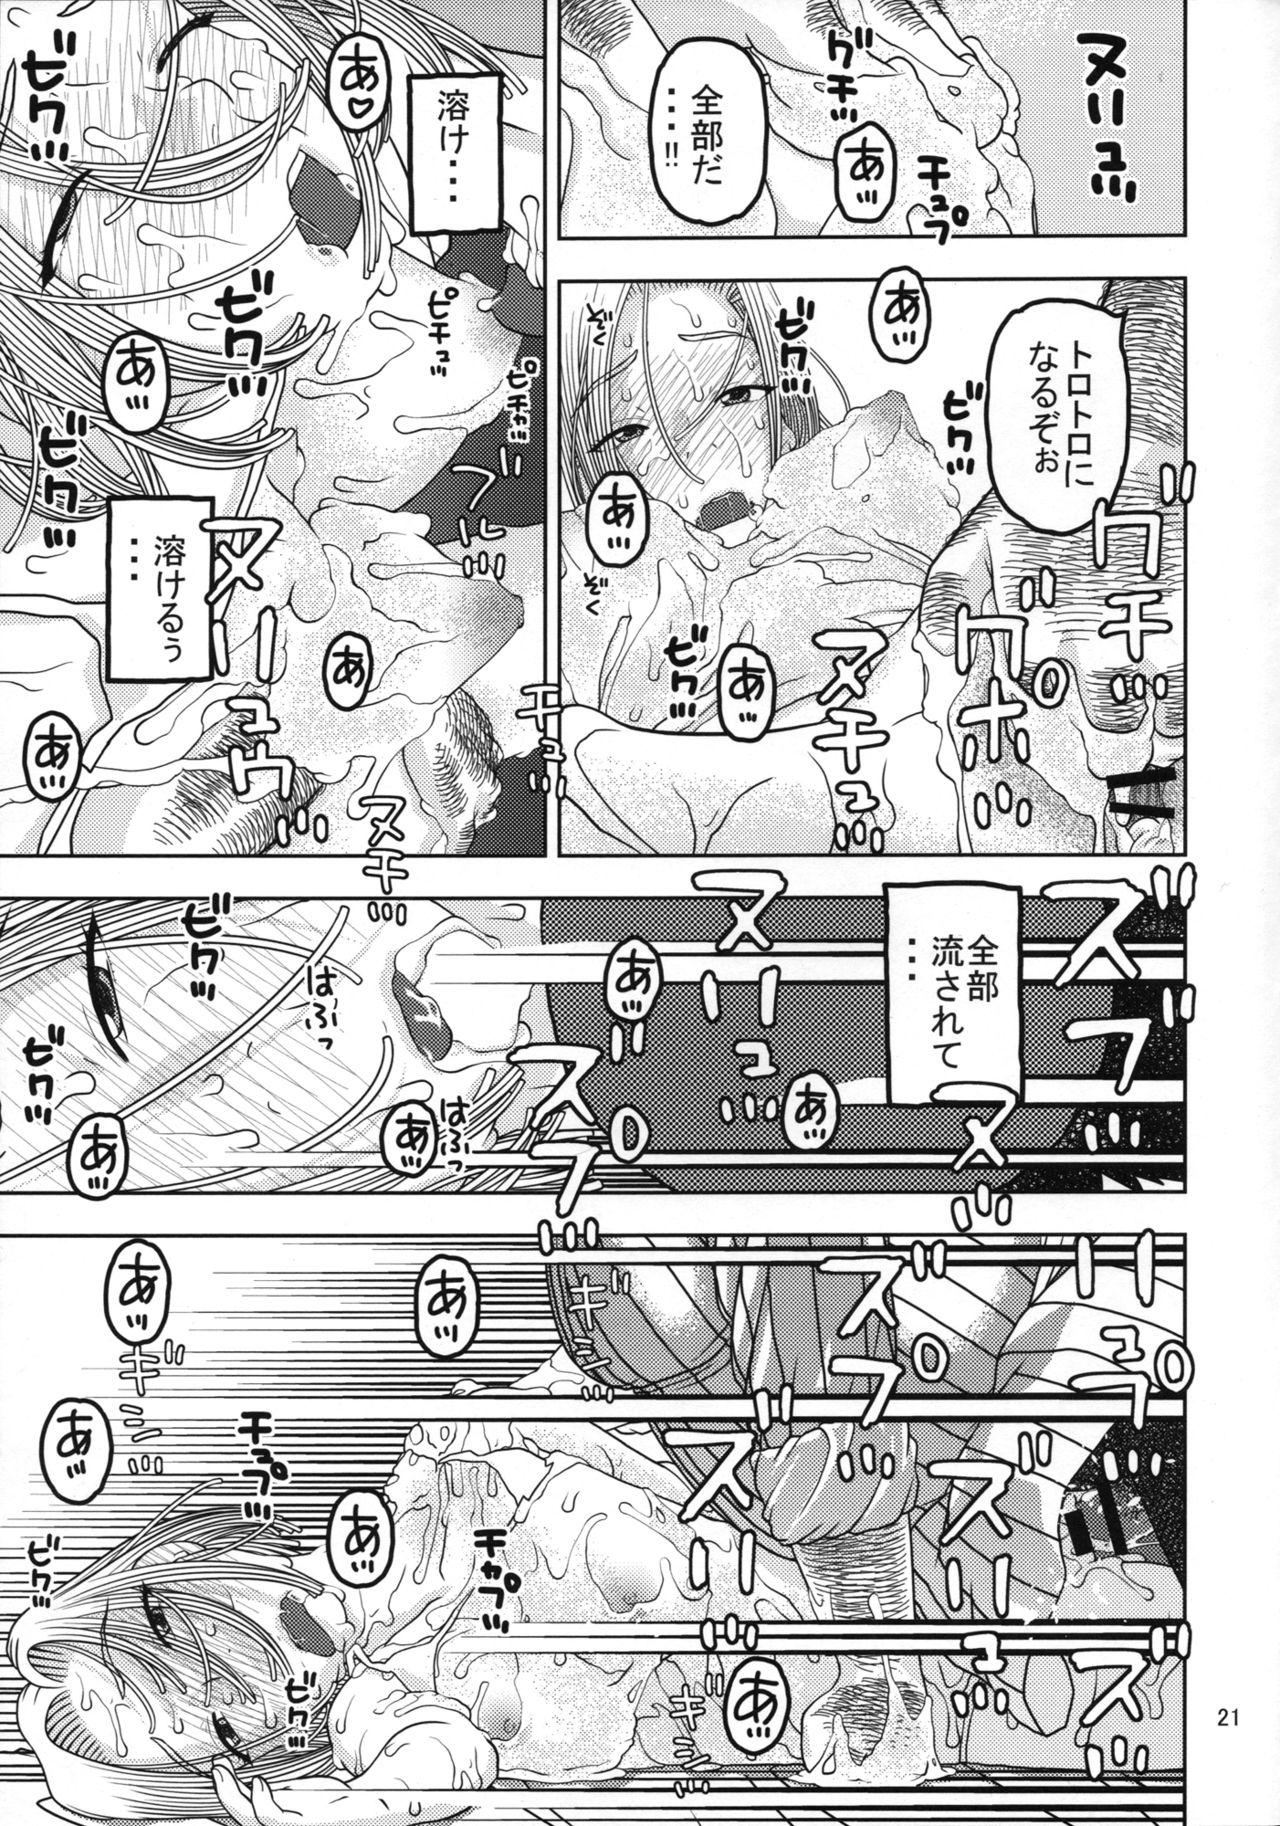 18-gou to Oil Massage de Seikou 19